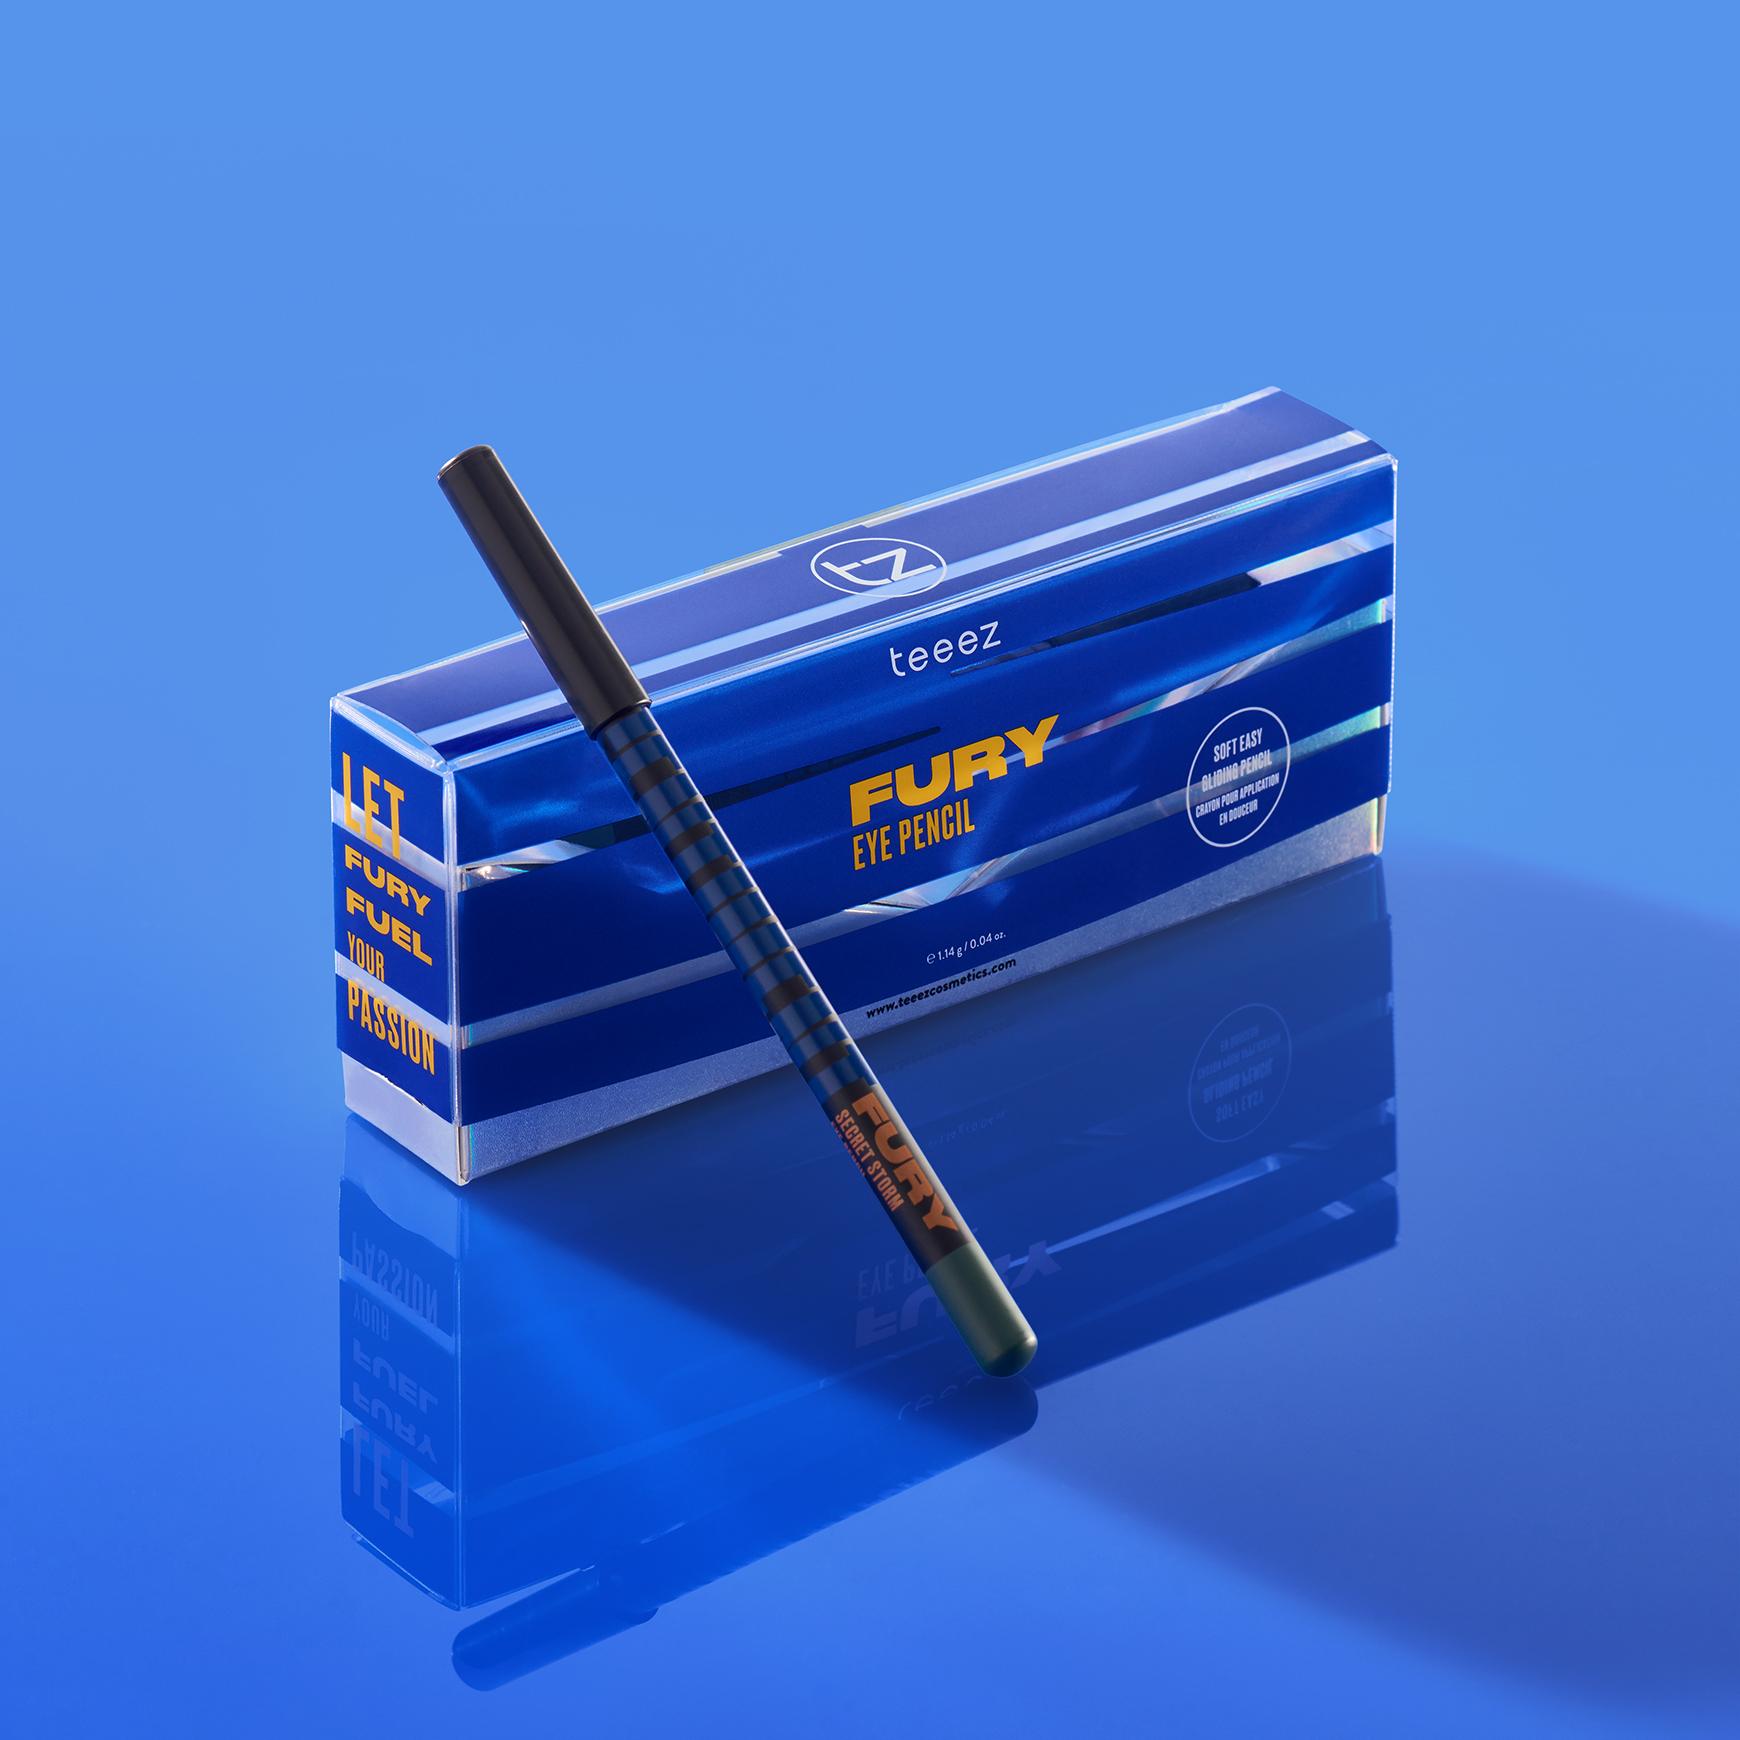 Fury-Eye-Pencil_1740-pixels